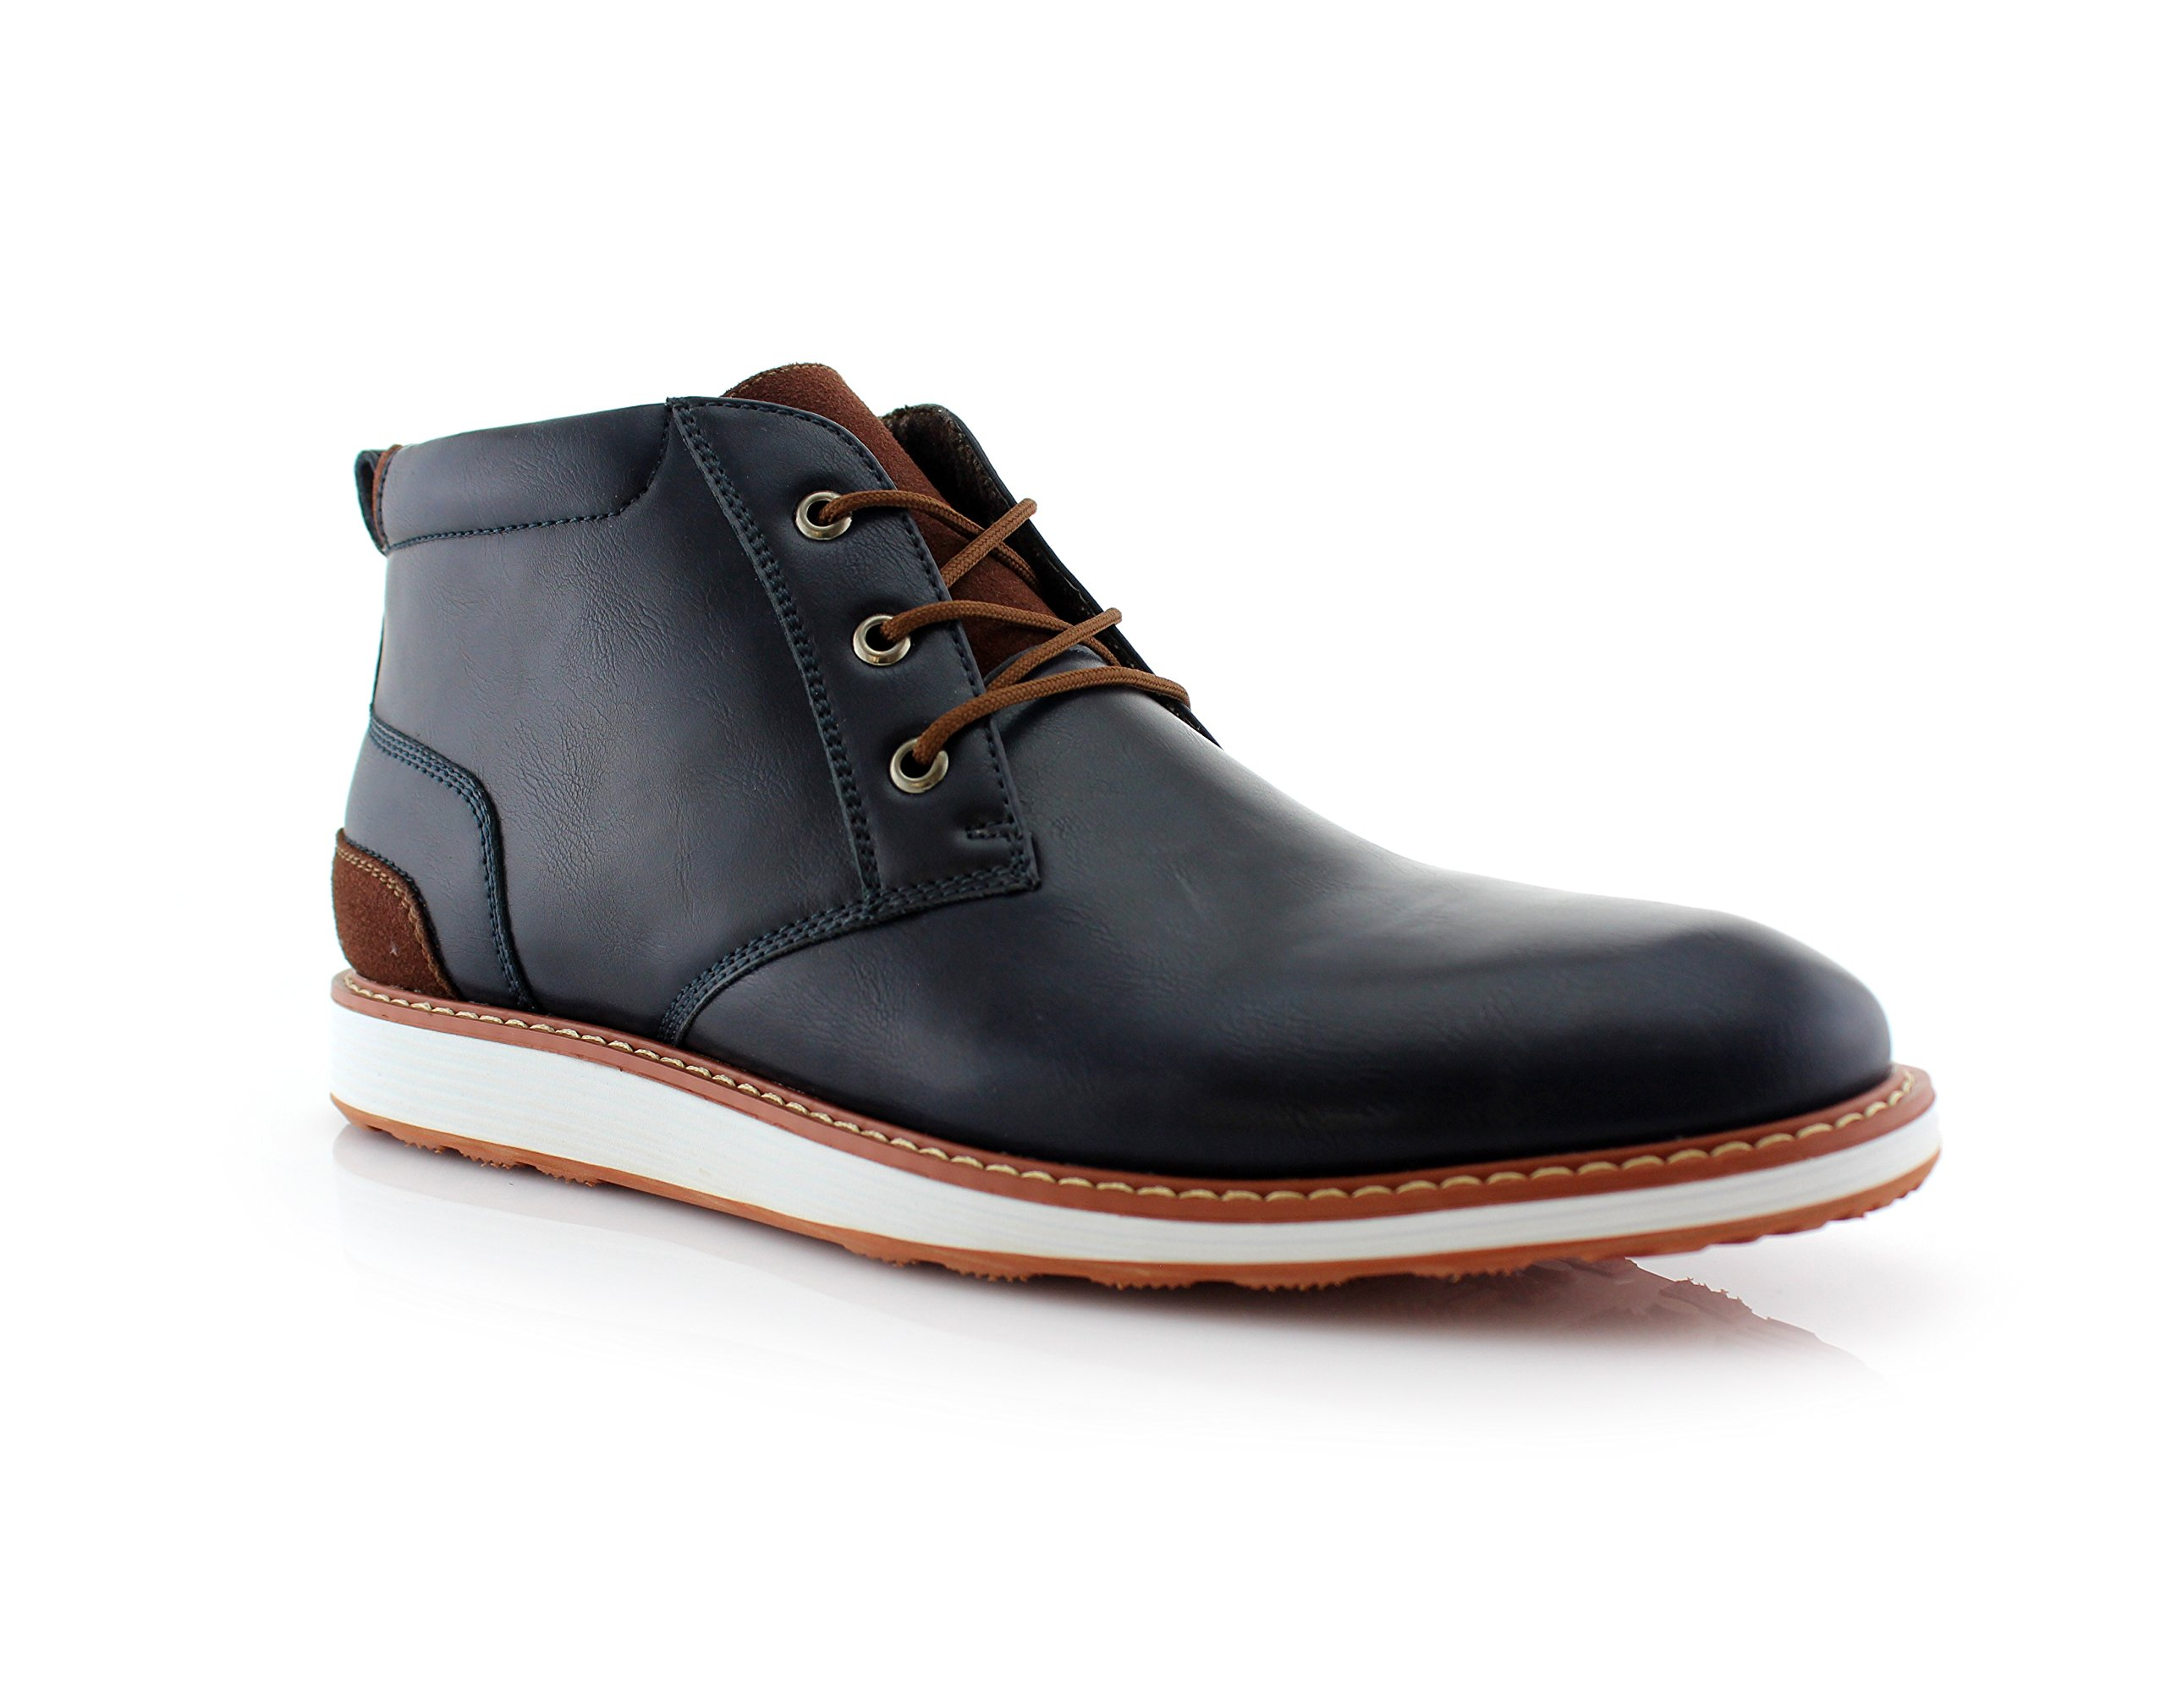 Ferro Aldo Houstan MFA506031 Mens Casual Chukka Mid-Top Sneaker Boots – Blue, Size 8.5